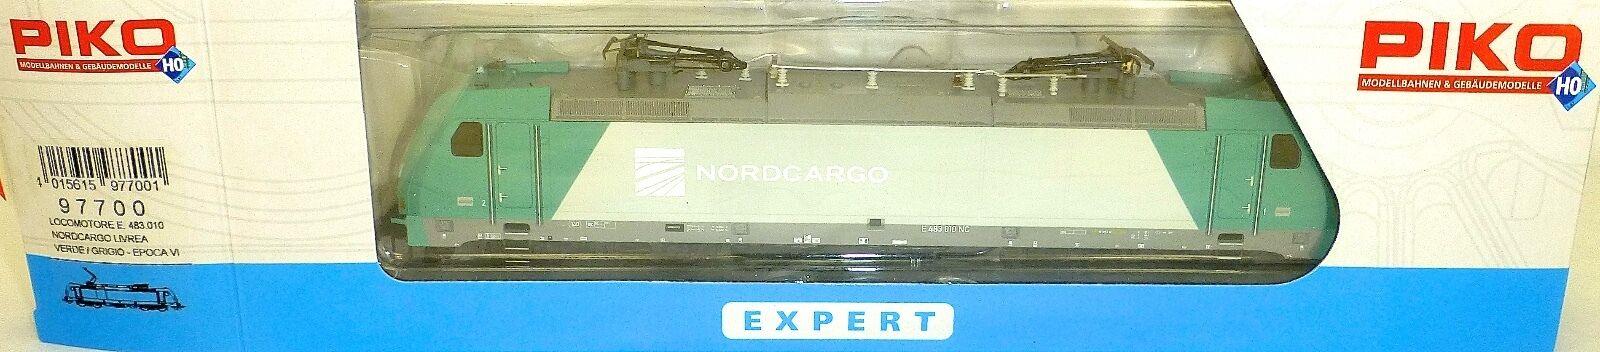 483.010 NordCochego verde gris Epvi Dss piko 97700 H0 1 87 Emb. Orig. Nuevo Μ HU4